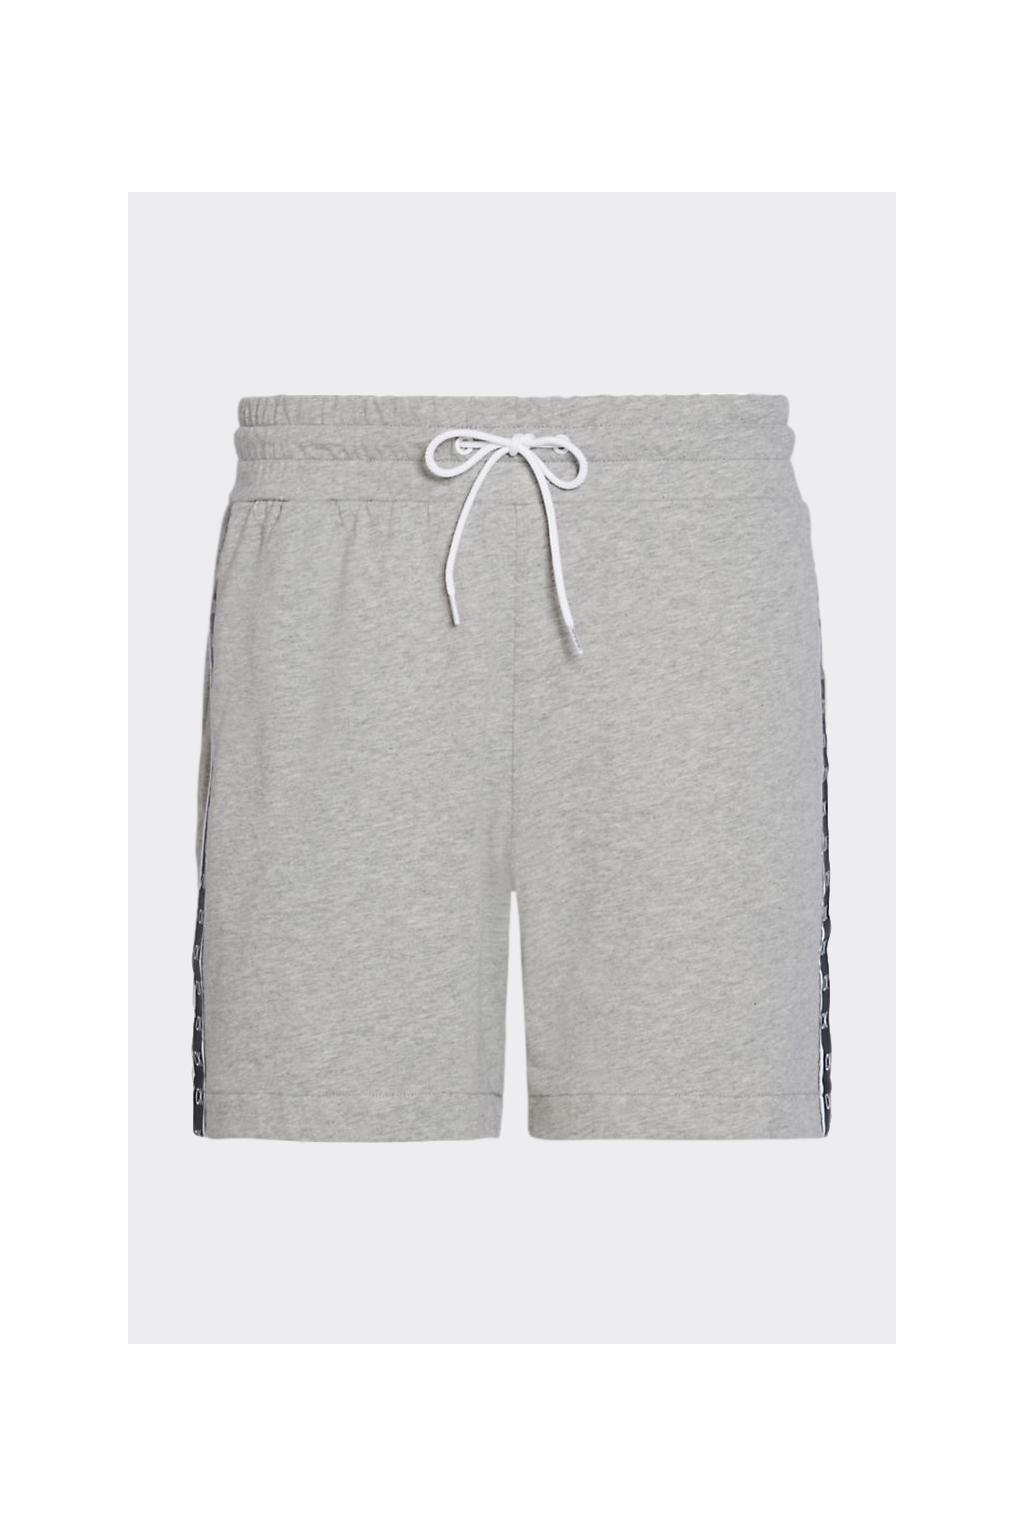 Calvin Klein šortky pánské s logo pruhem - šedé